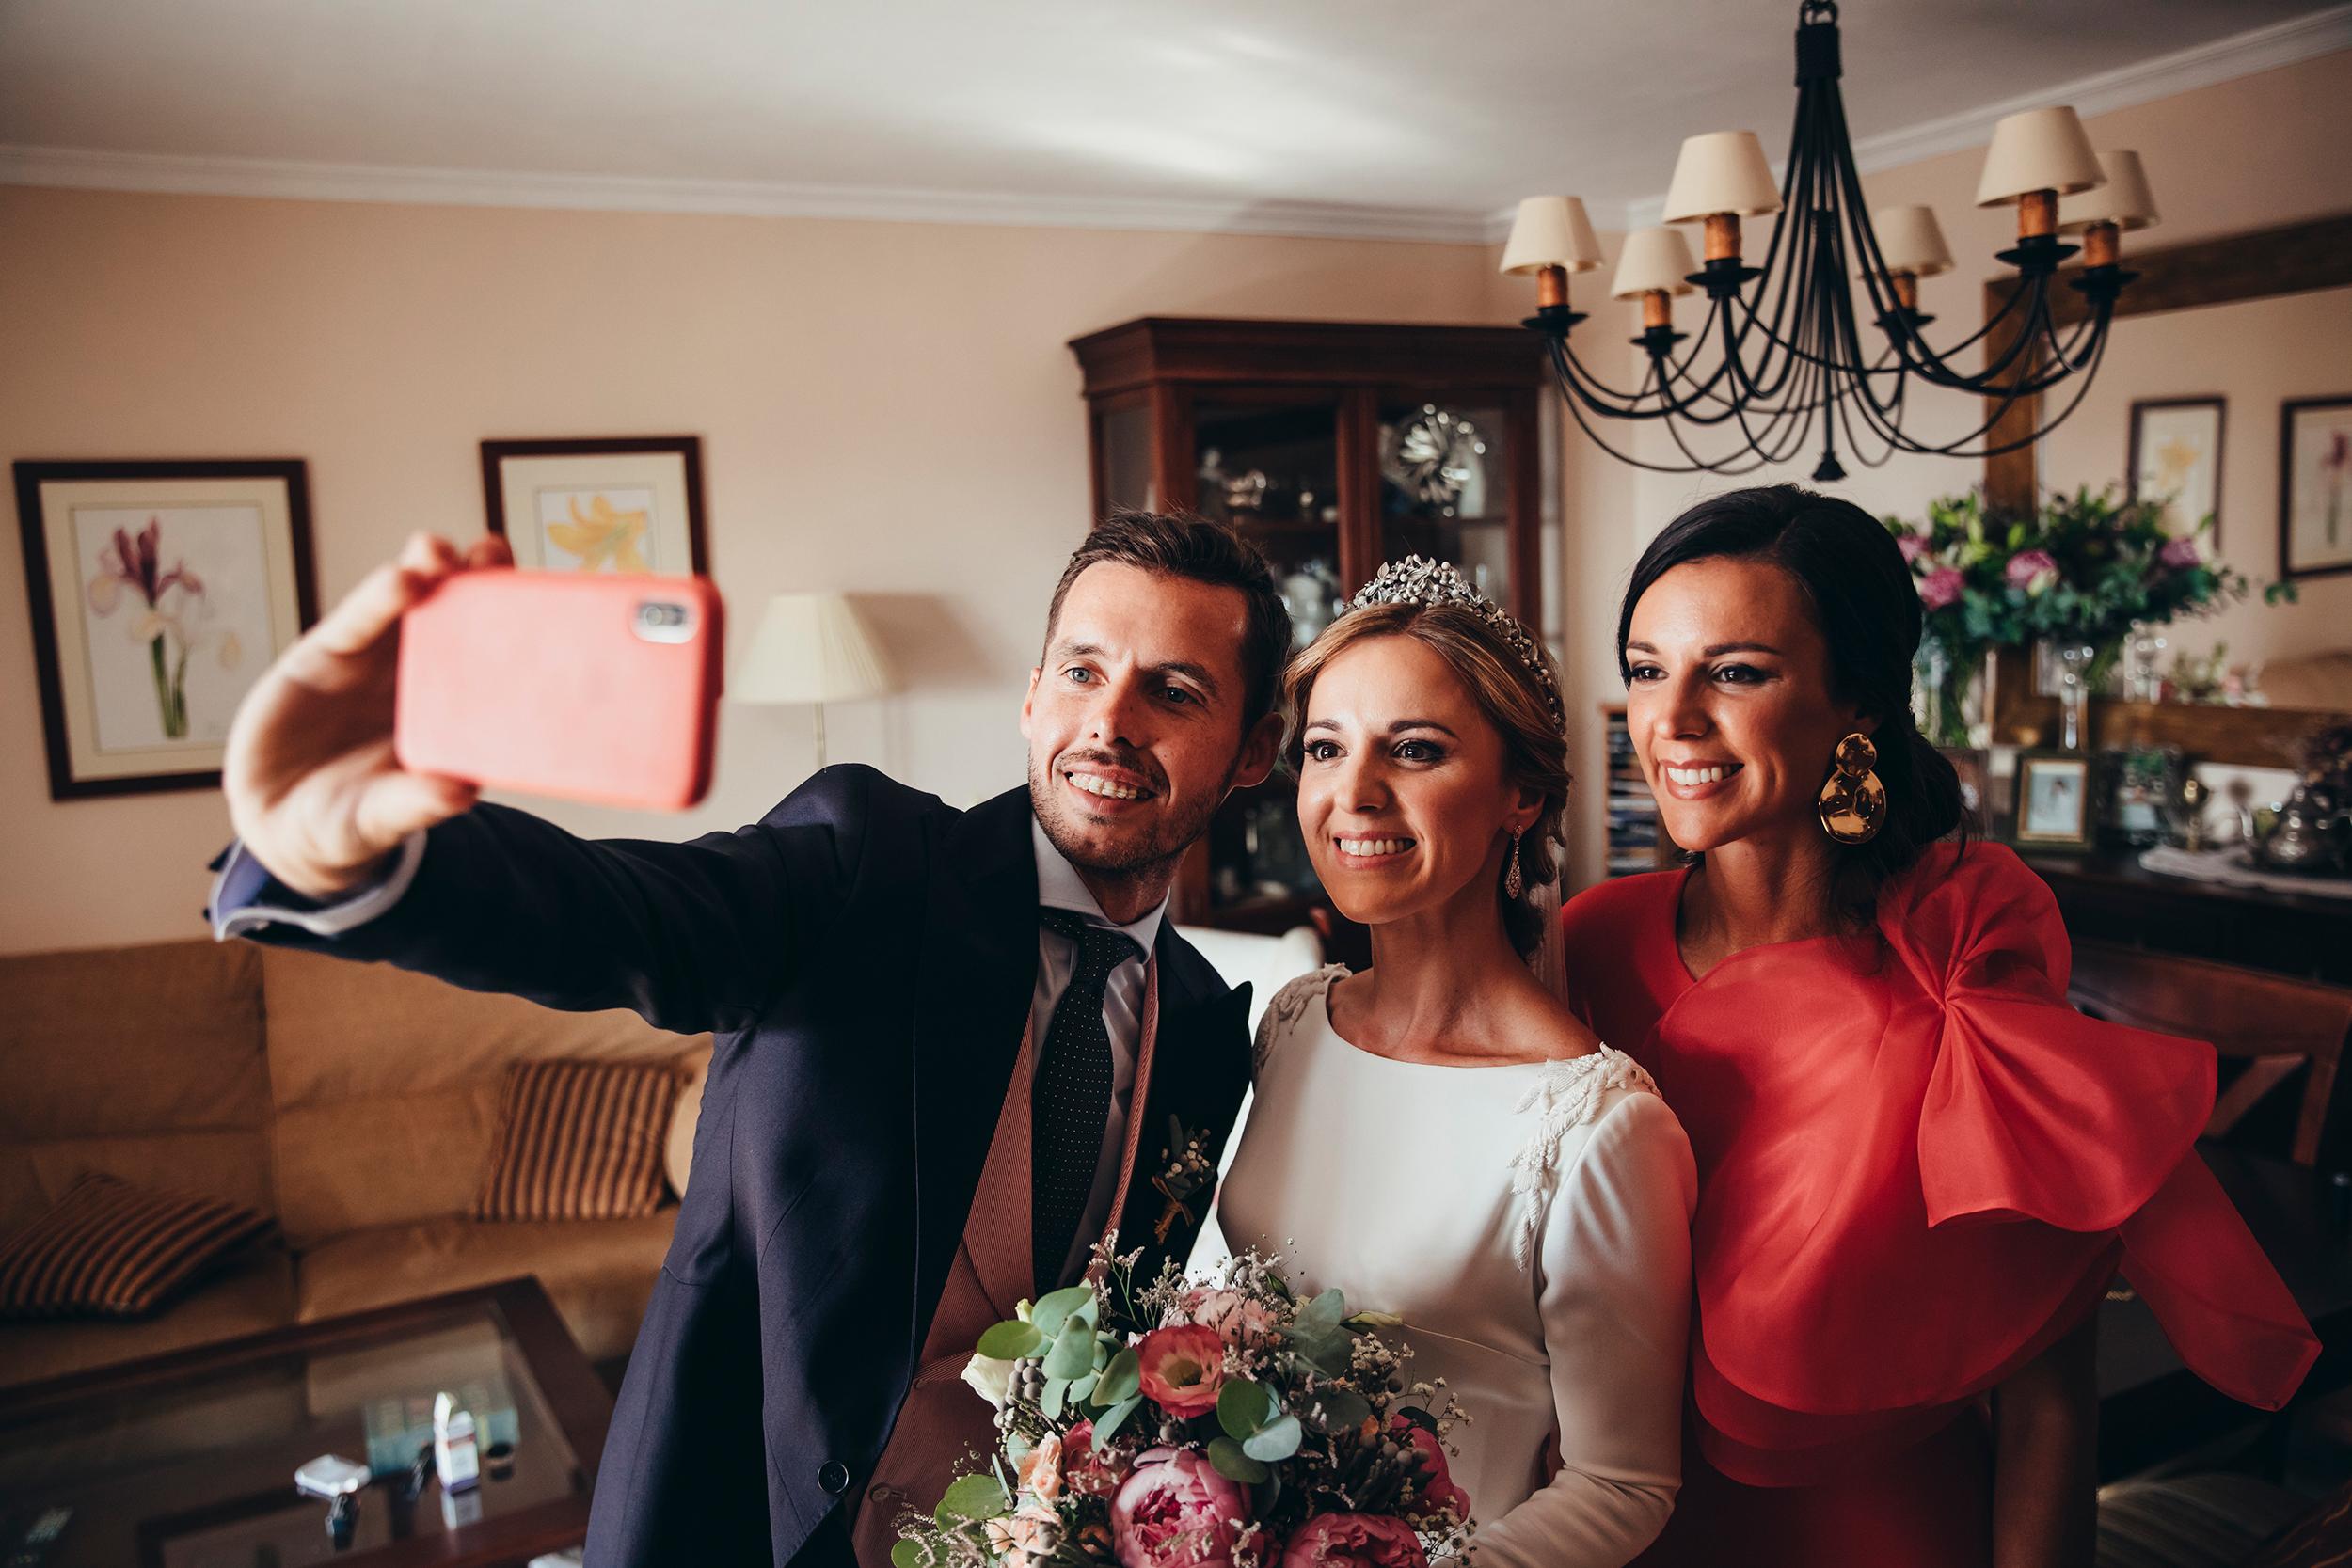 fotografo-bodas-granada-catedral-sagrario-jose-reyes_015.jpg